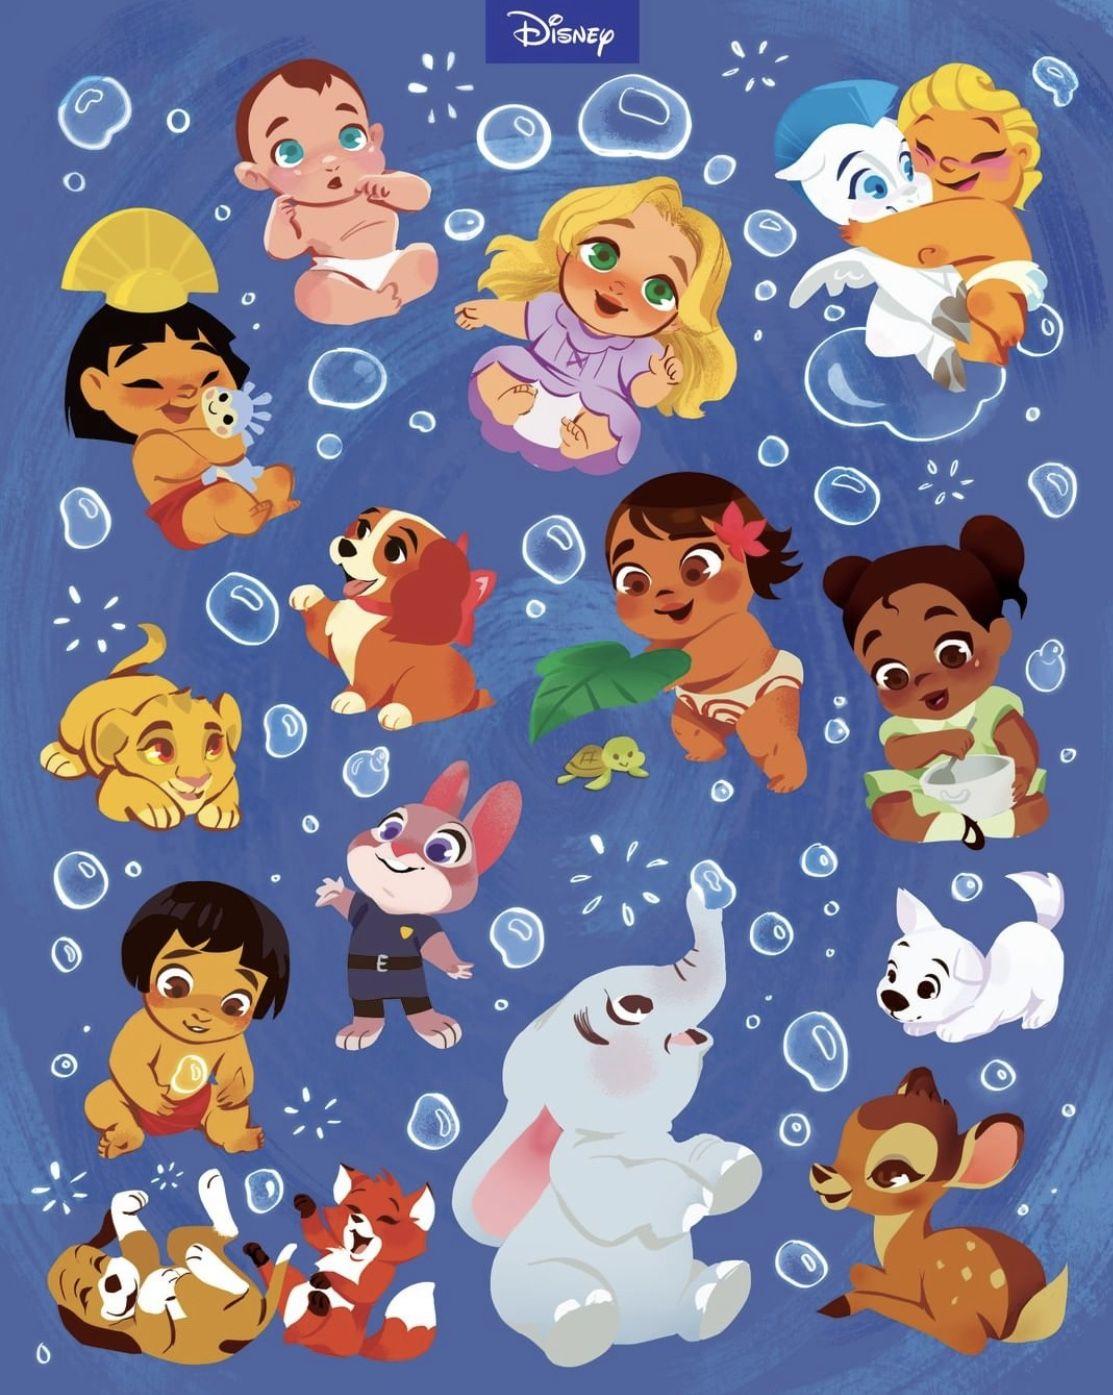 Disney Characters Cute Background Disney Characters Wallpaper Baby Disney Characters Kawaii Disney